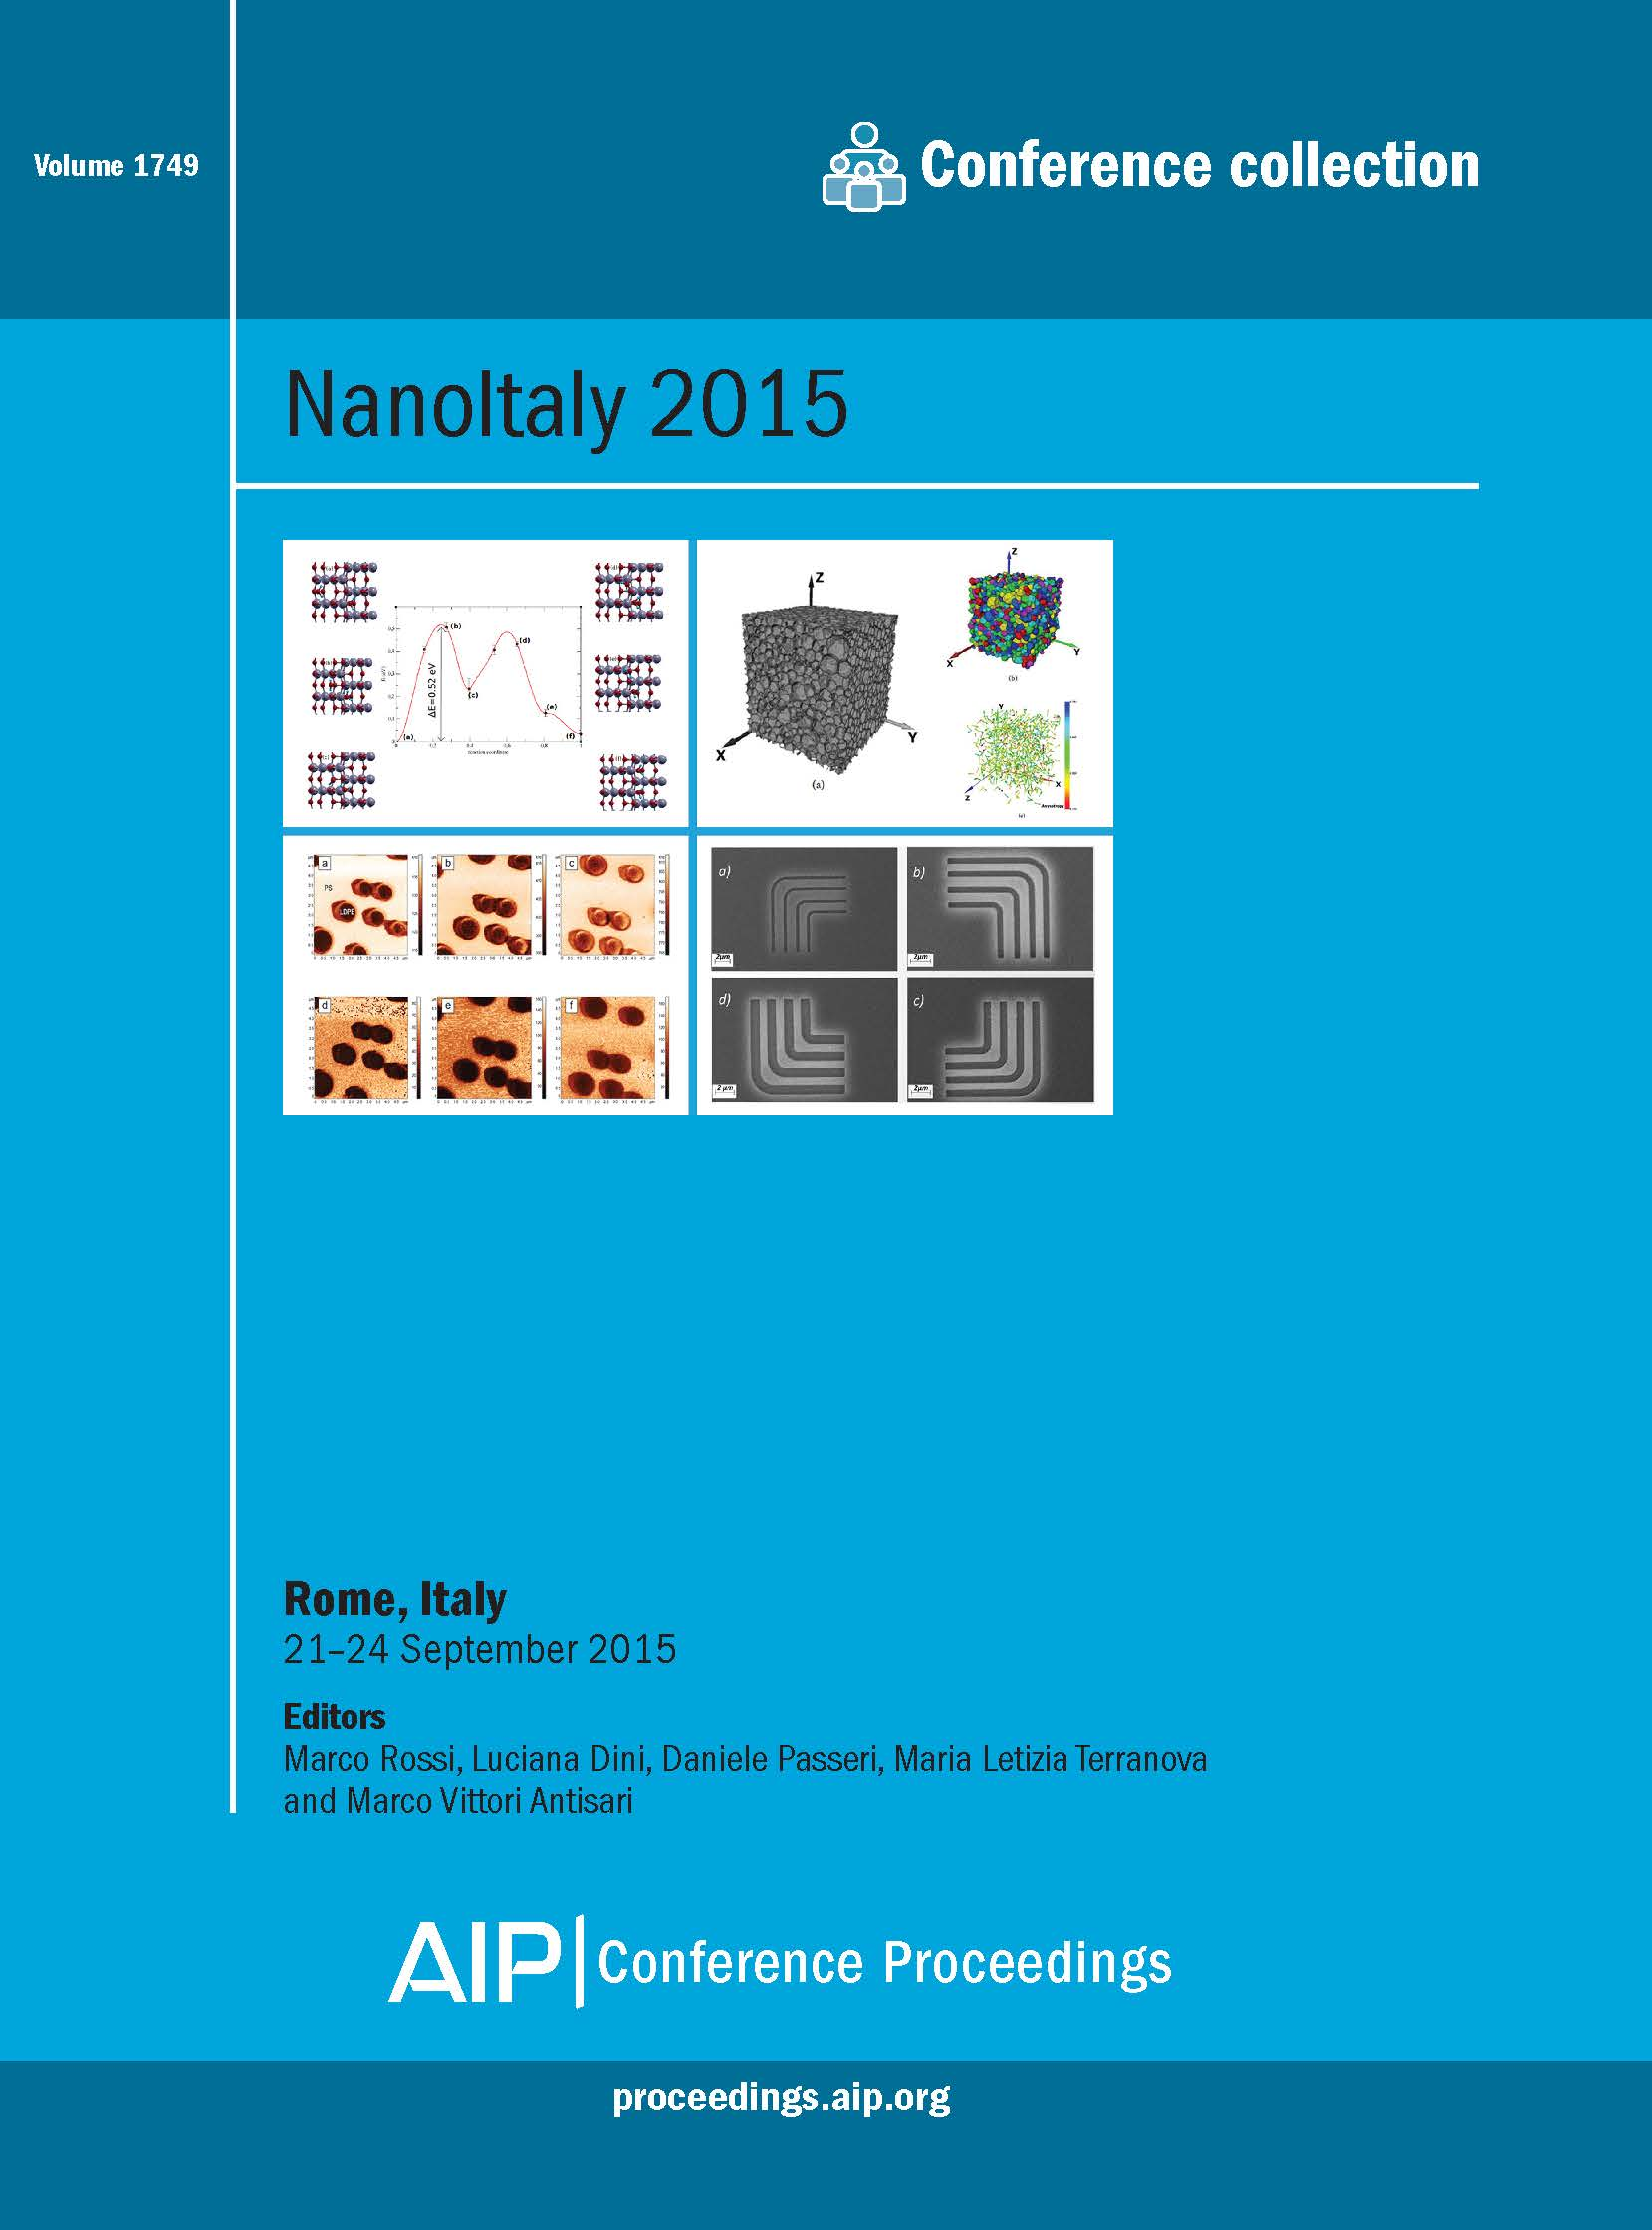 Volume 1749: NanoItaly 2015 | AIP Publishing Print on Demand